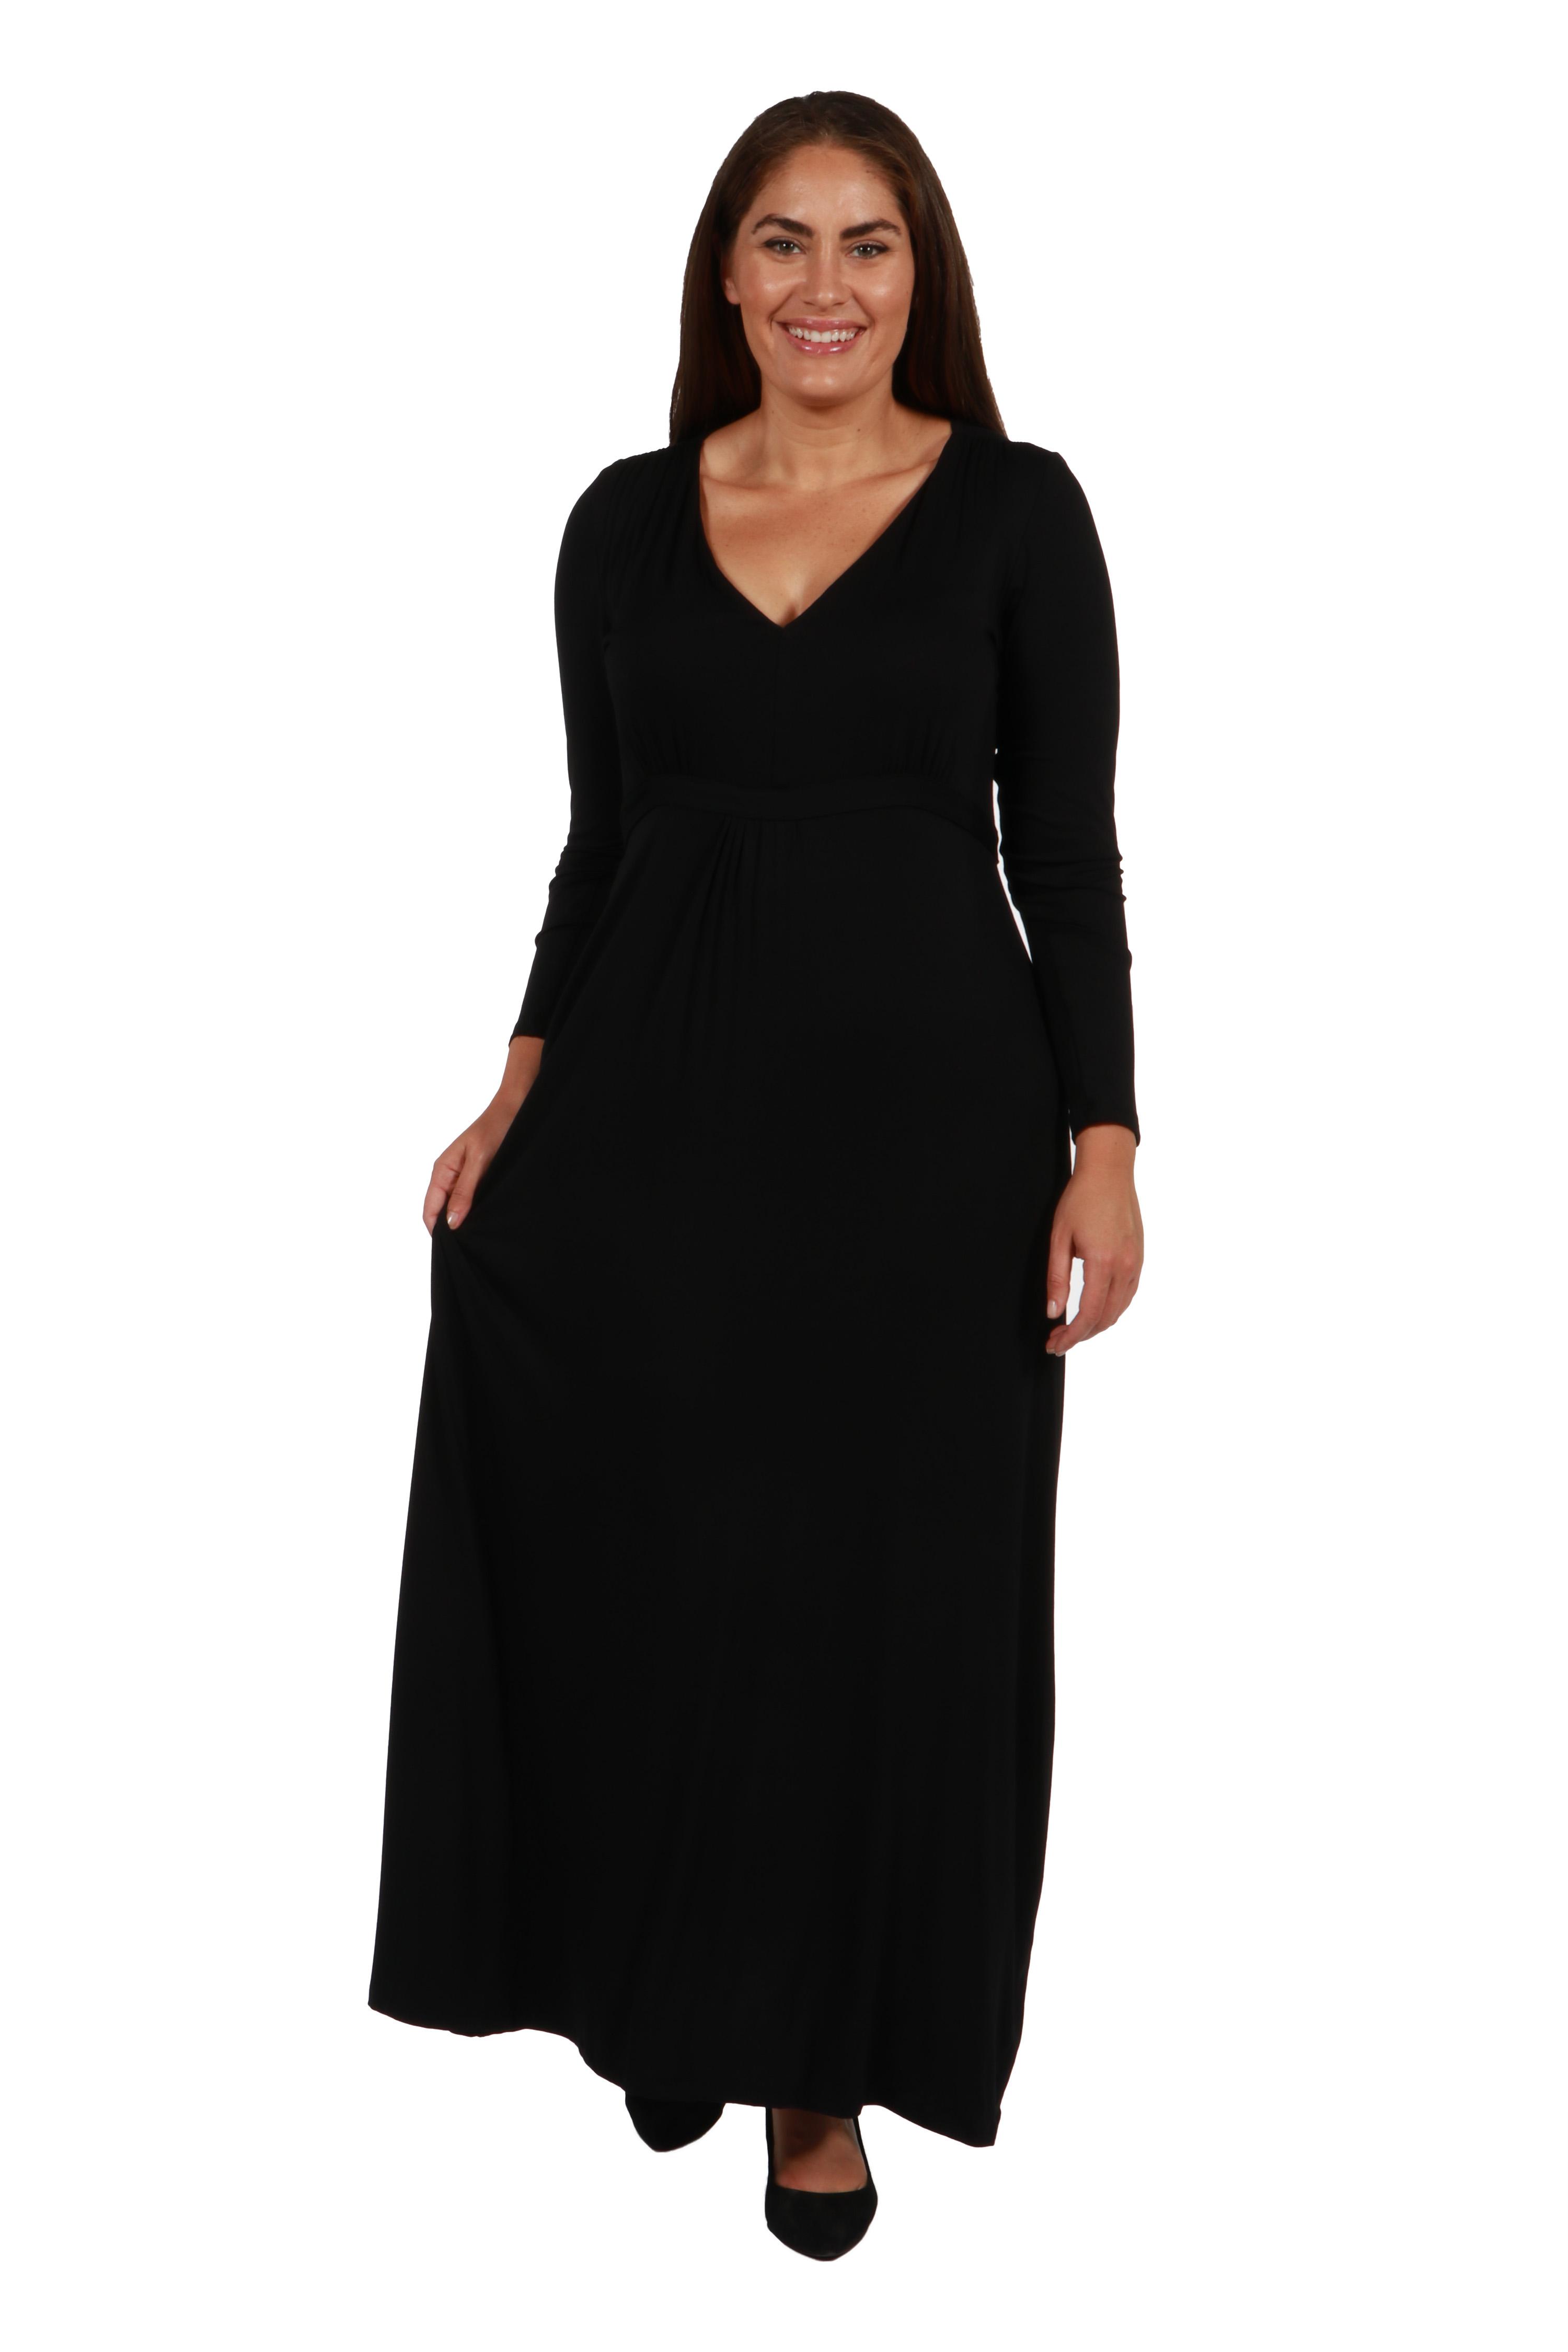 Size 2X Plus Size Dresses - Sears